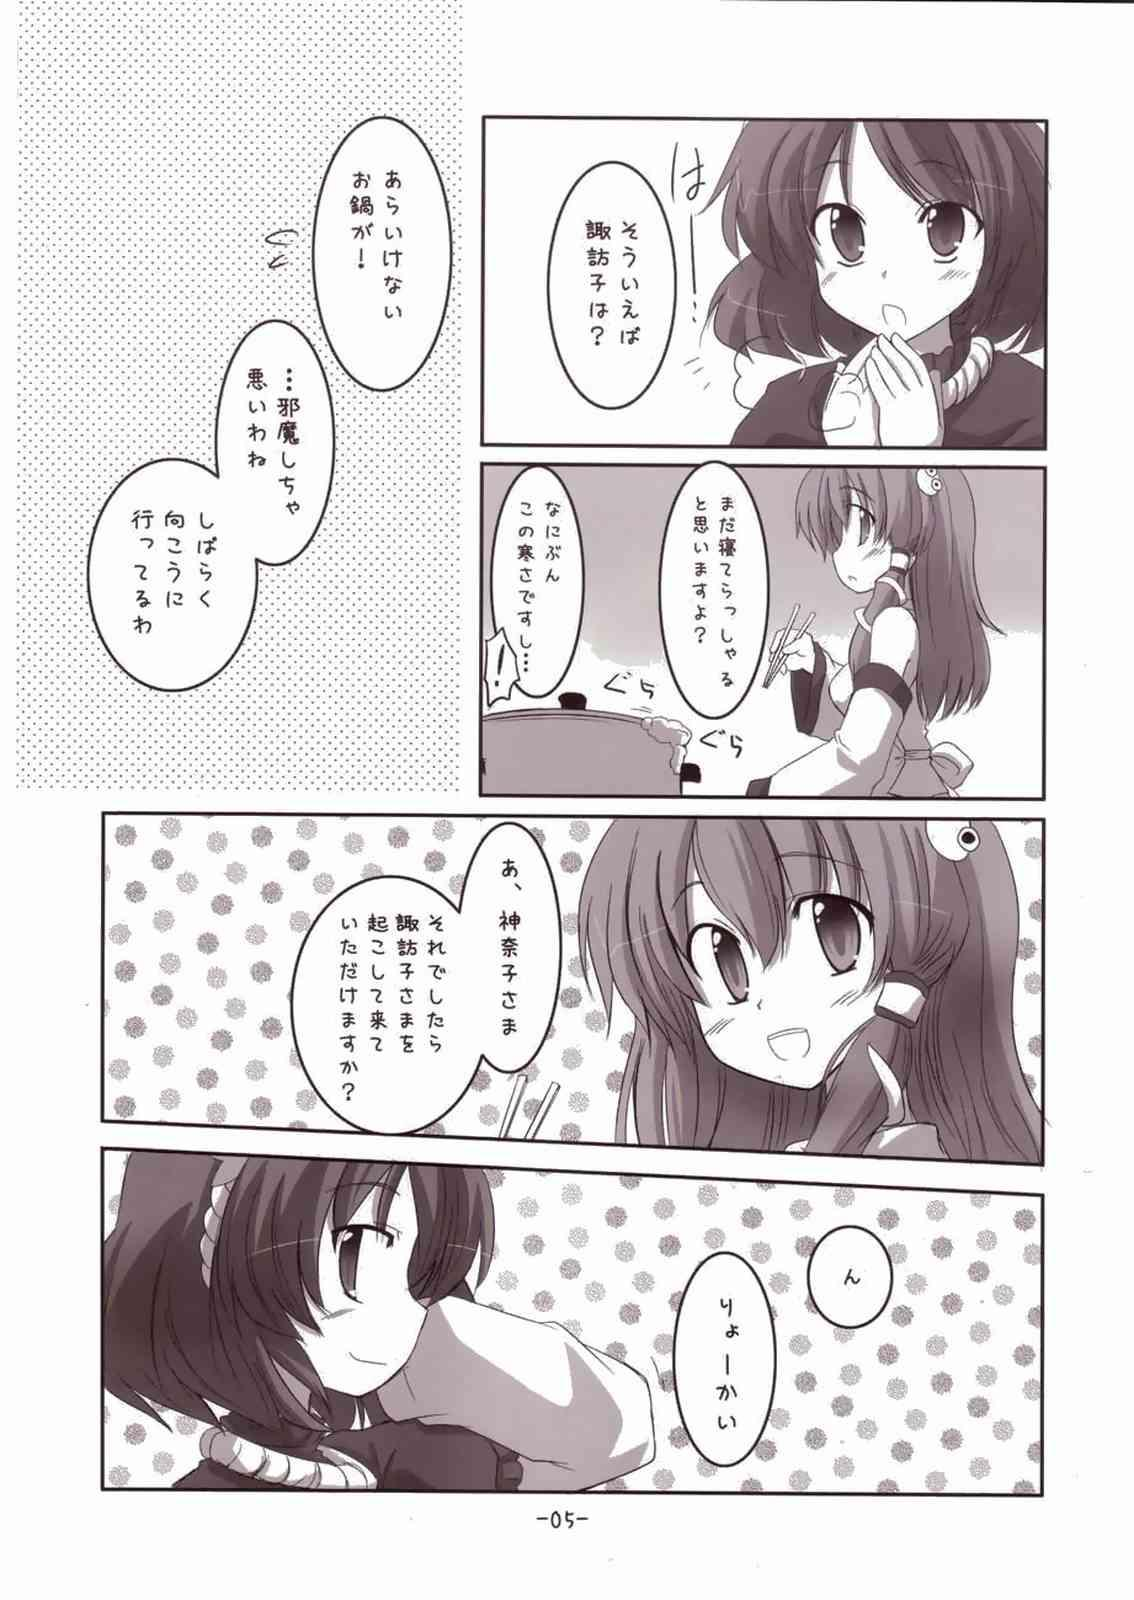 Suwako-sama to Issho! 4